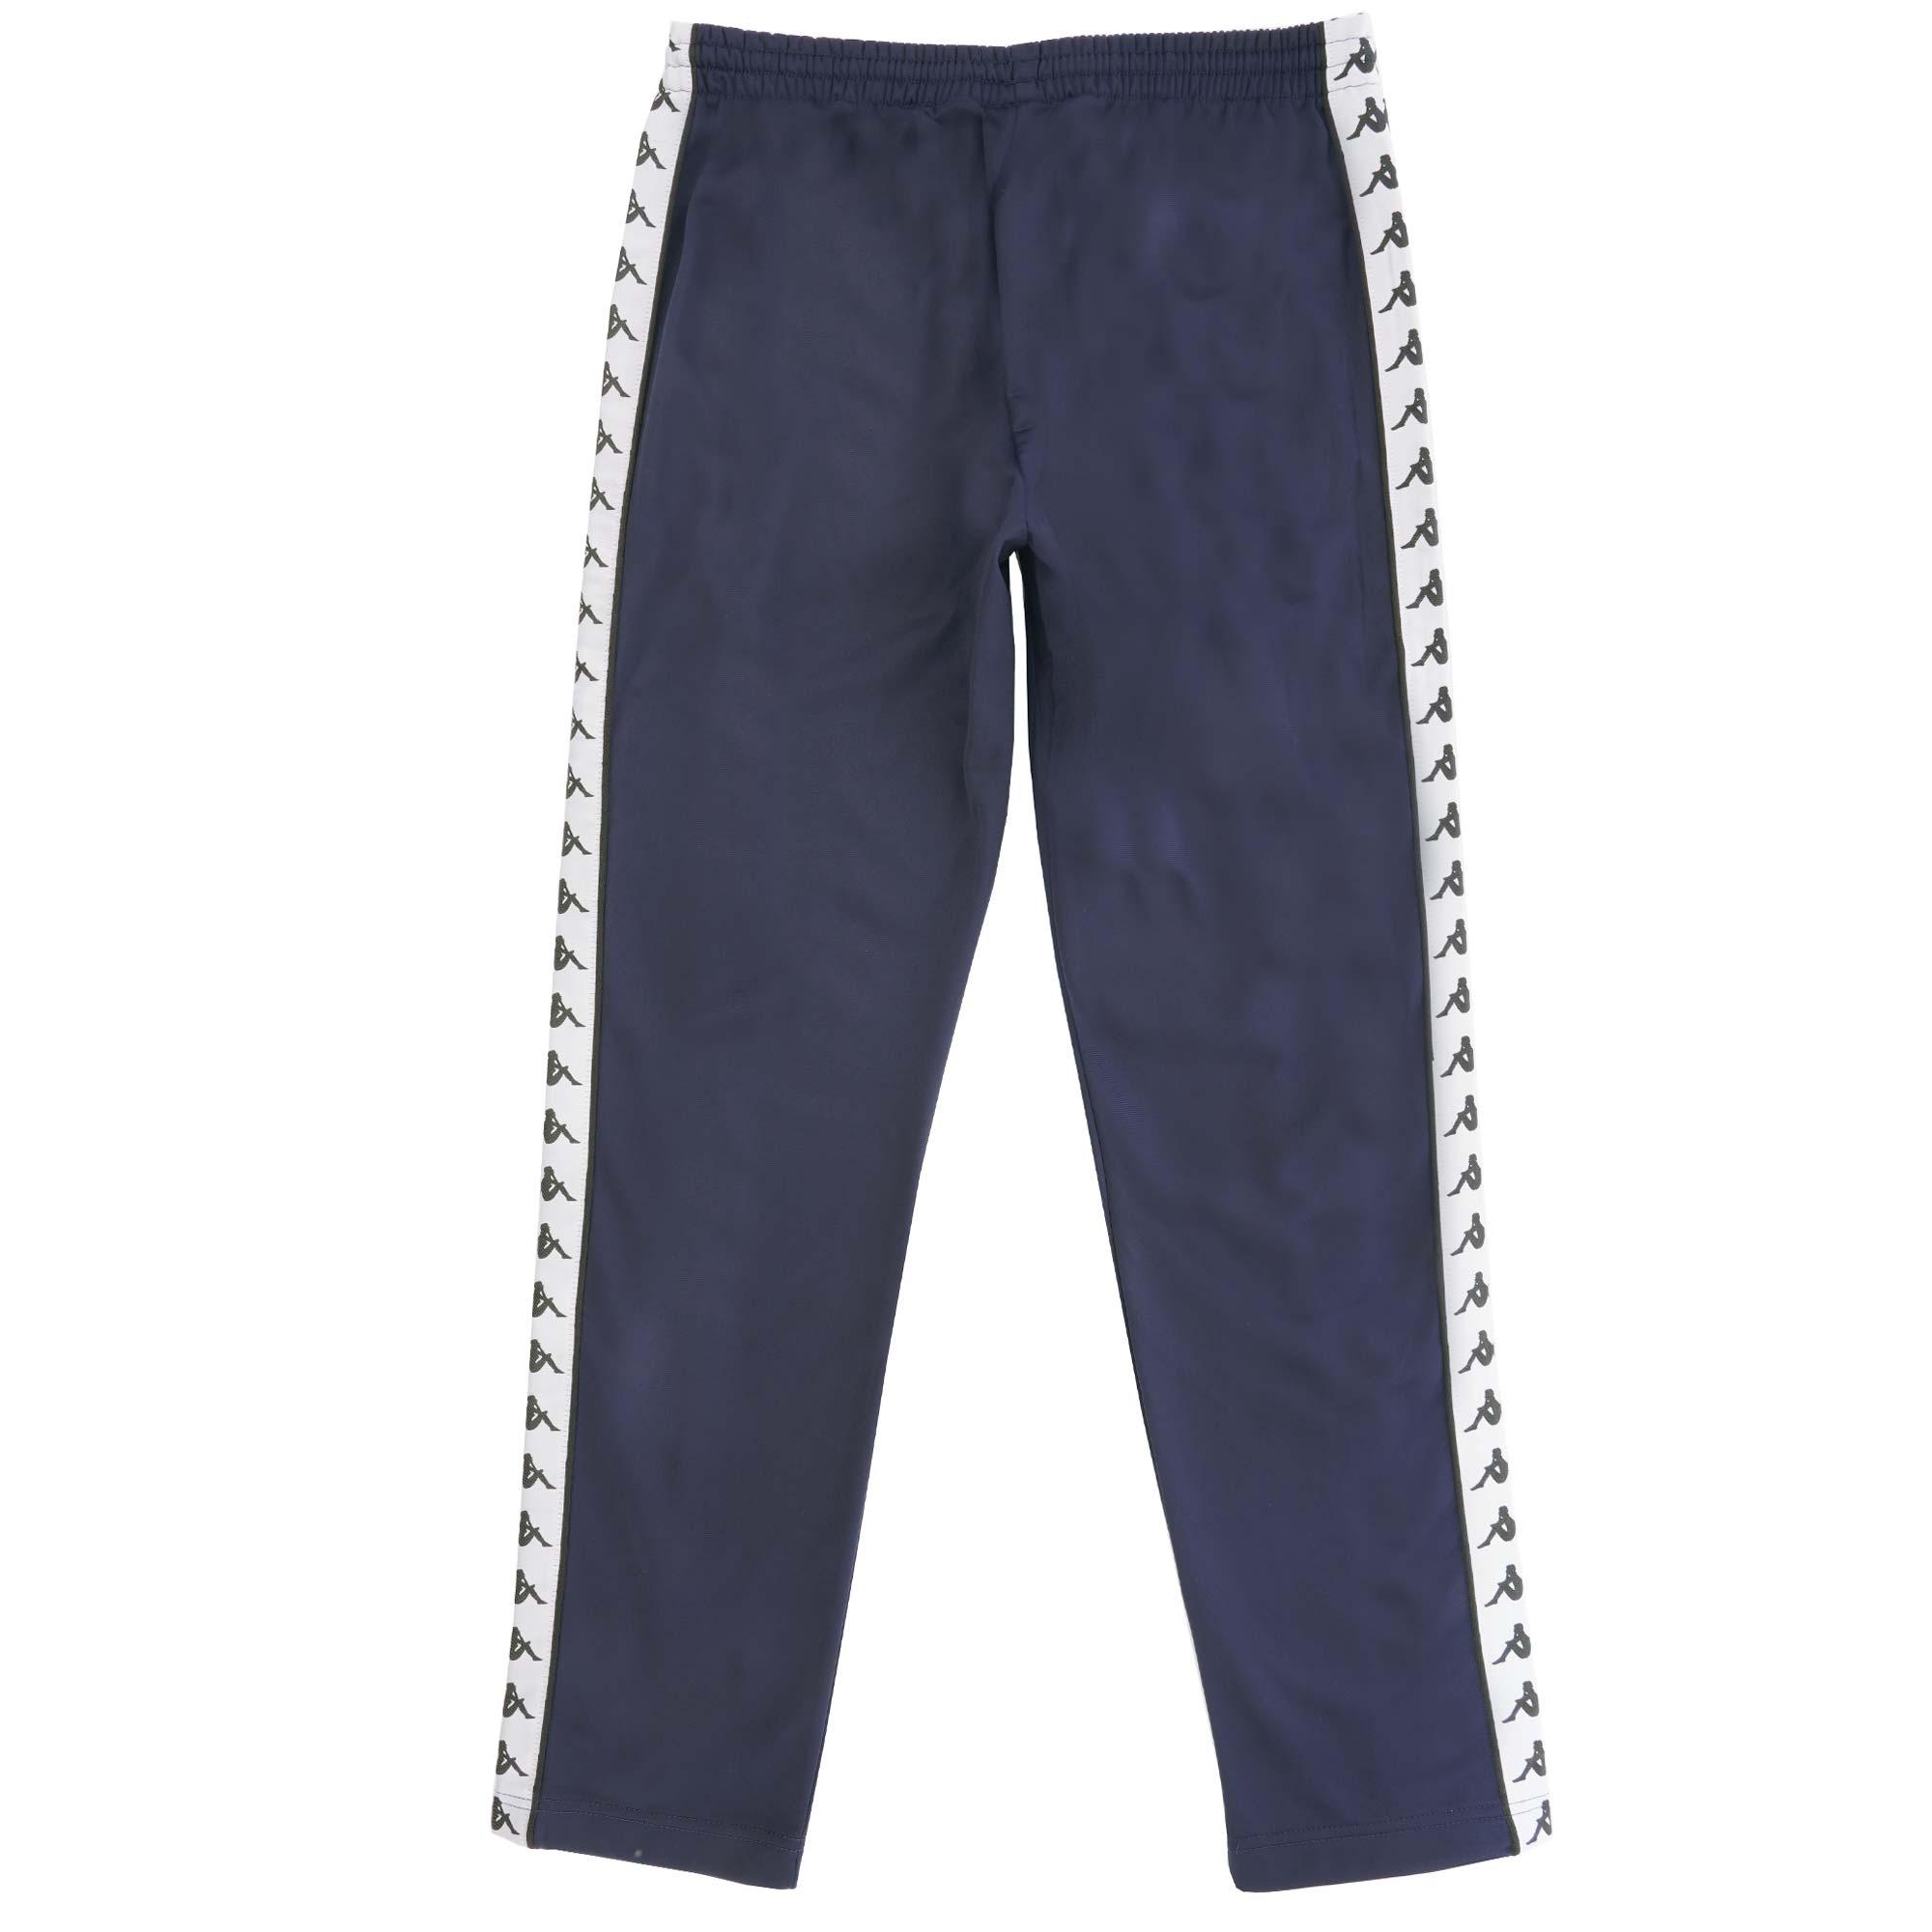 bd9870b9 Kappa 222 Banda Astoria Track Pants   Blue & Black   301EFS0-C94